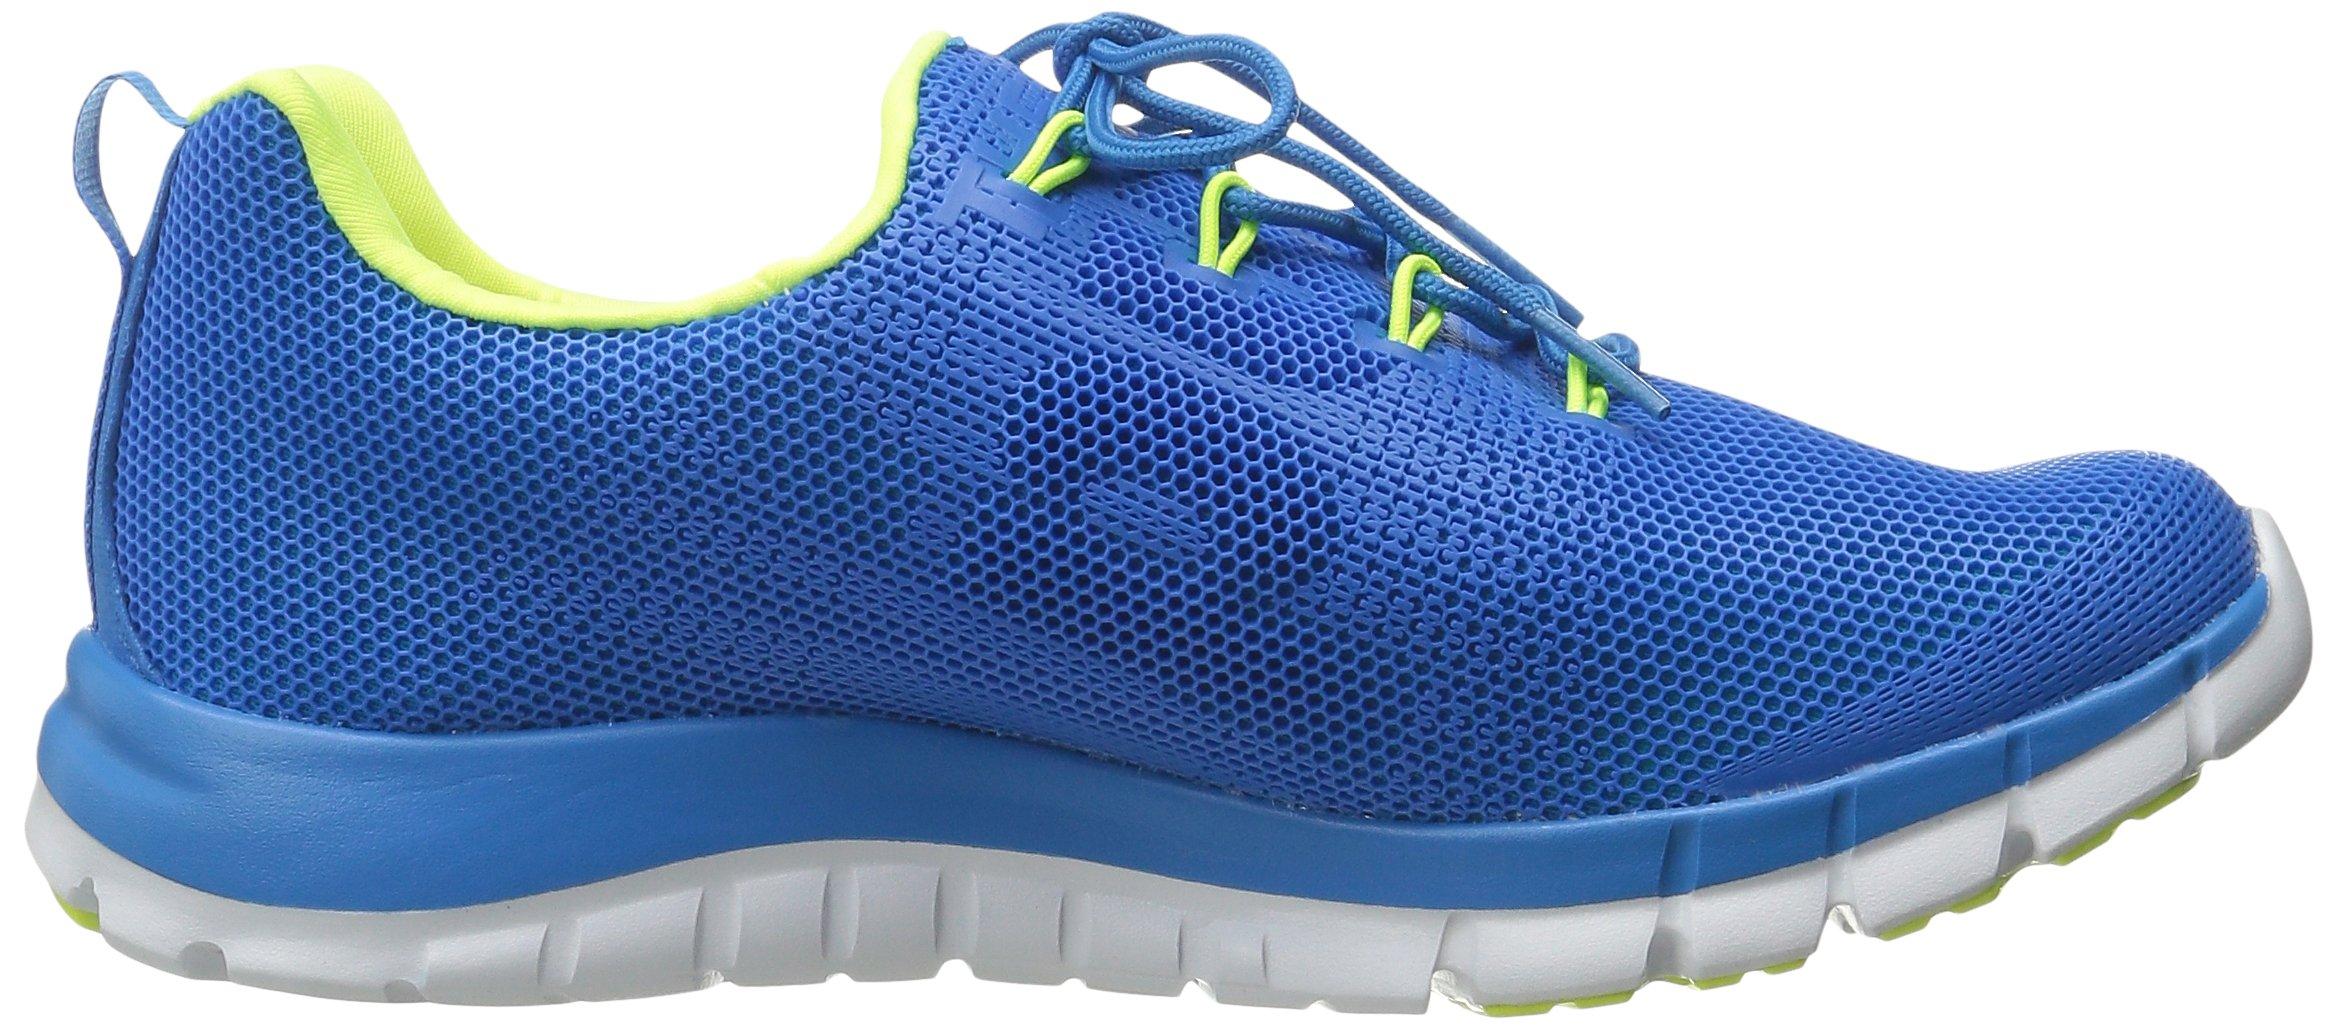 81t4nLfhSSL - Reebok Women's Z Pump Fusion Polyurethane Running Shoe